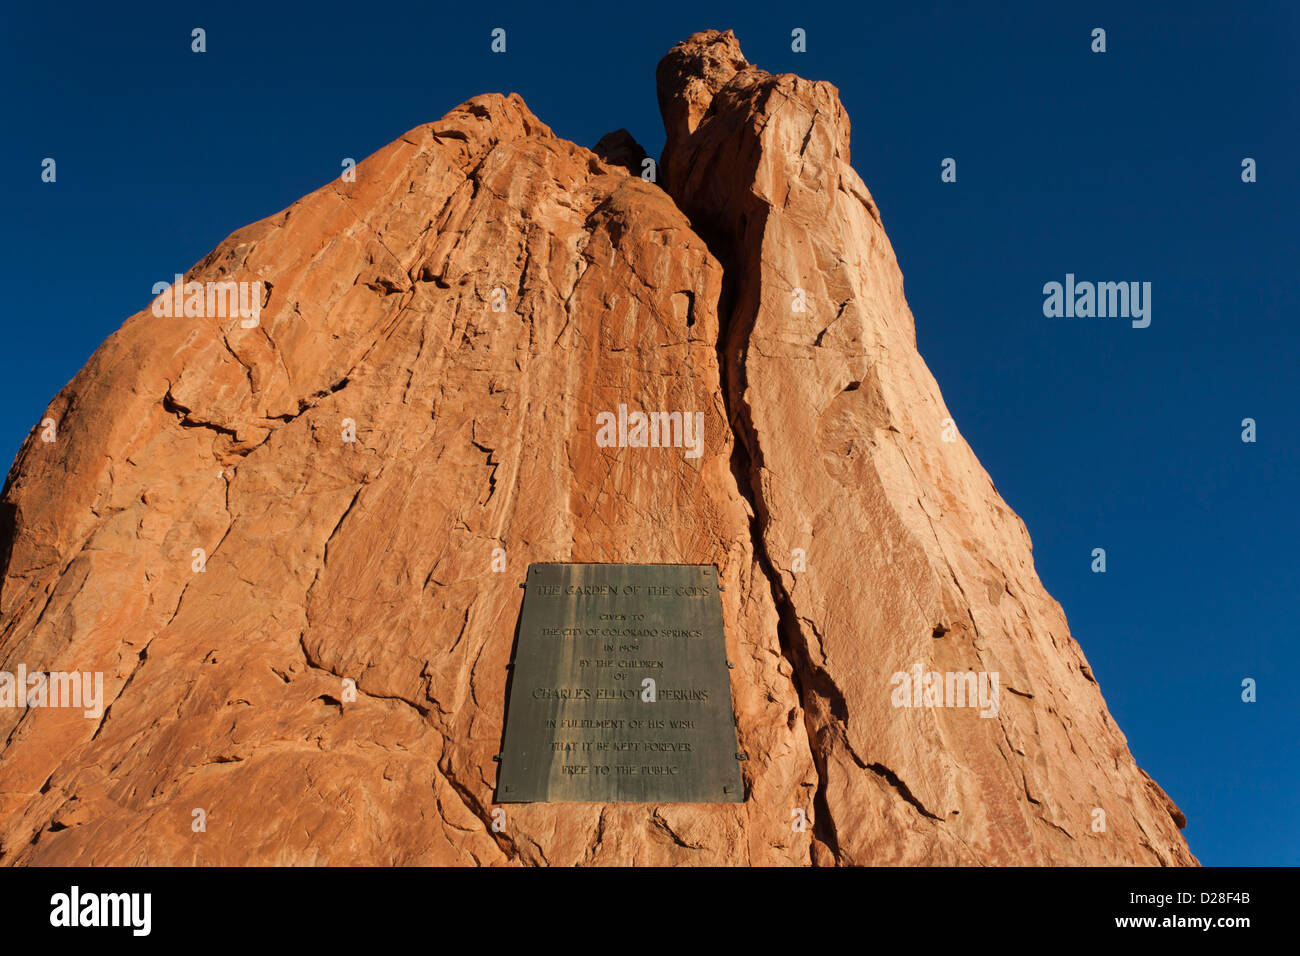 USA, Colorado, Colorado Springs, Garden of the Gods, rock formations, dawn - Stock Image